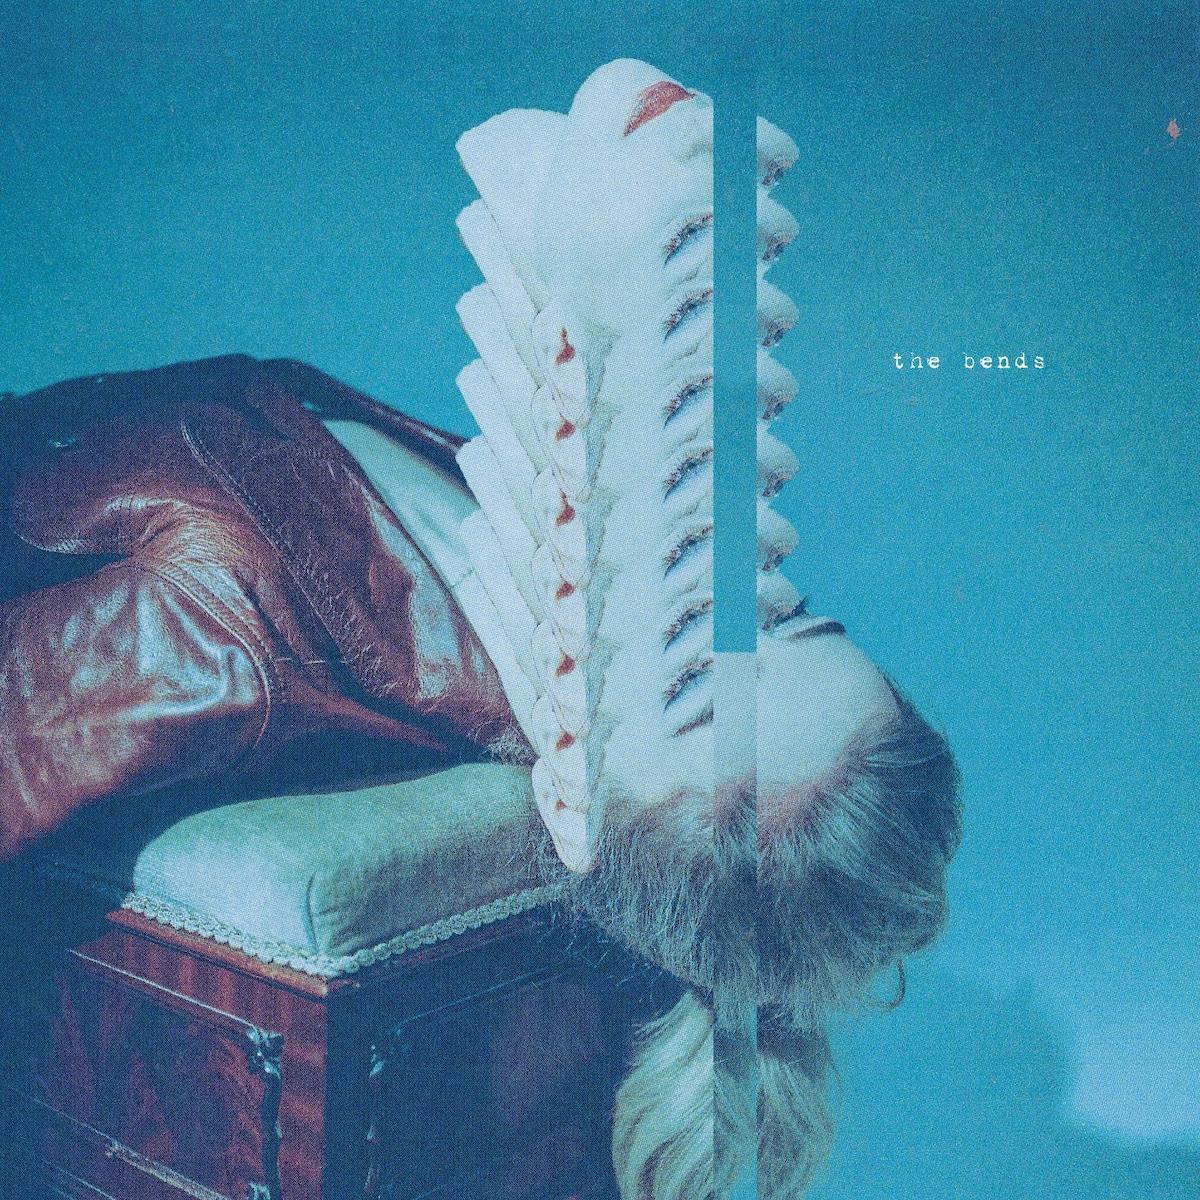 rosie carney the bends album artwork Rosie Carney Announces Radiohead Covers Album, Shares Her Version of Bones: Stream